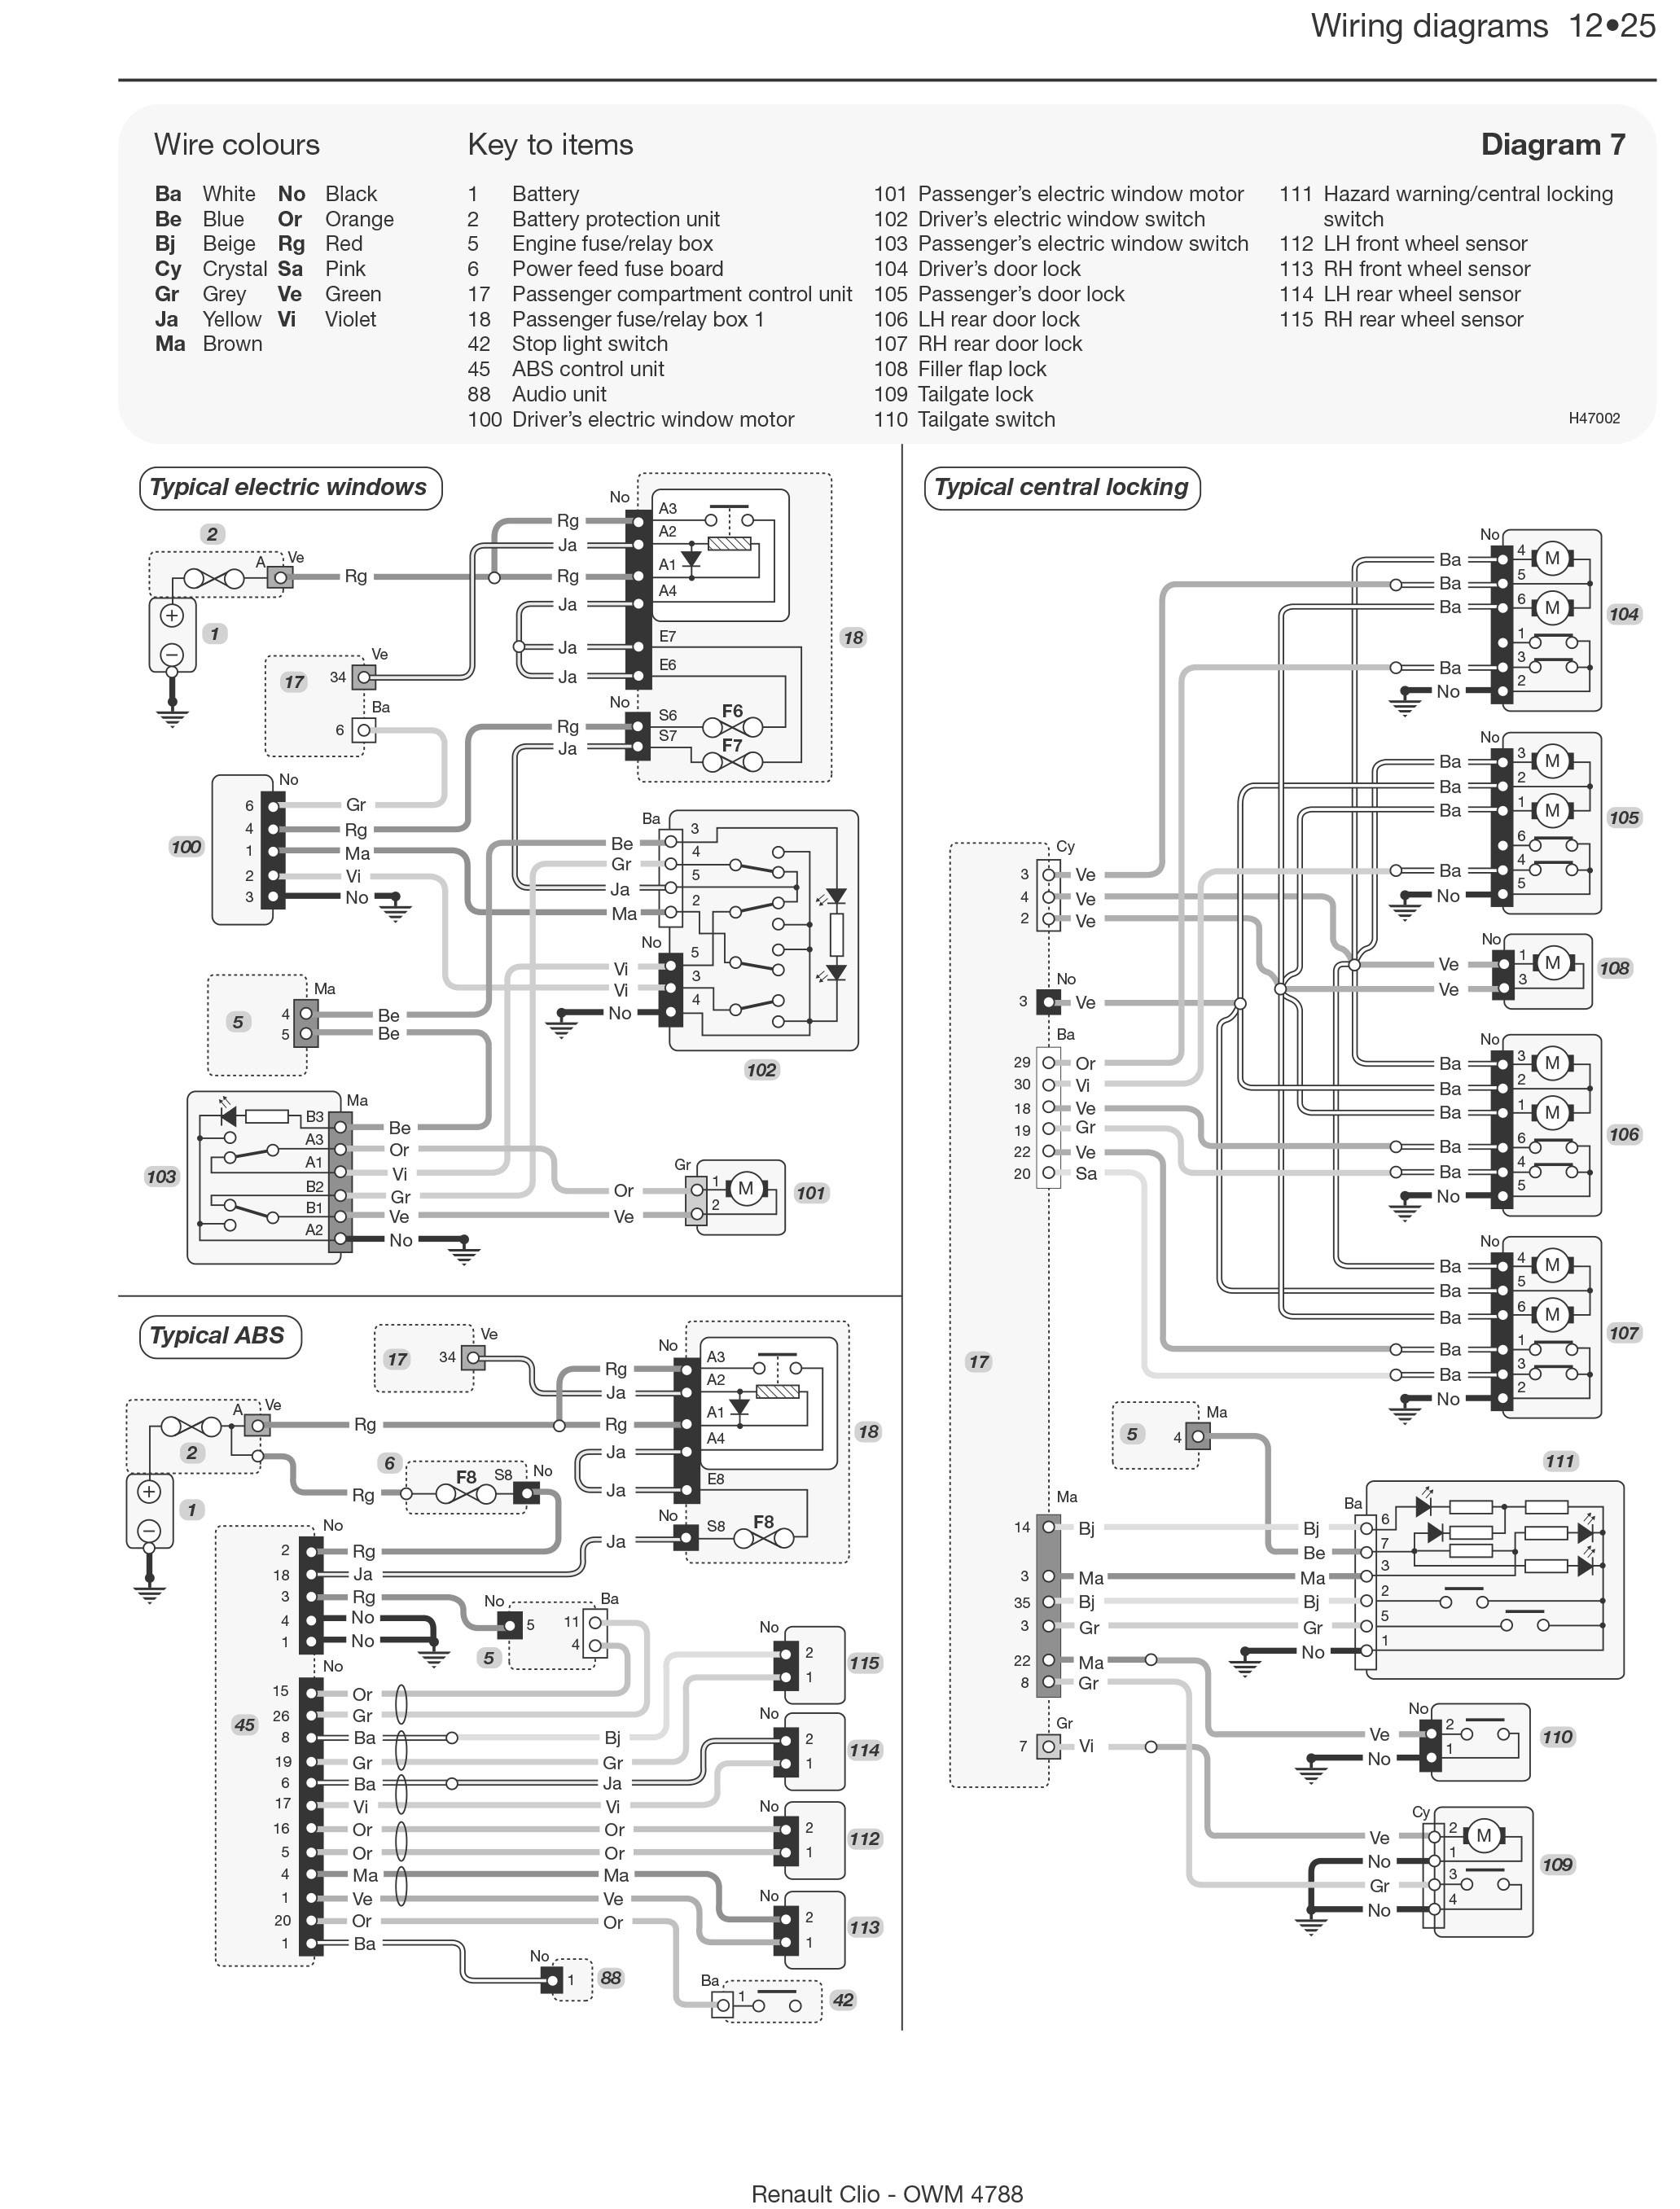 Renault Clio Engine Diagram Renault Na Ii Wiring Diagram Endearing Enchanting Clio Blurts Of Renault Clio Engine Diagram